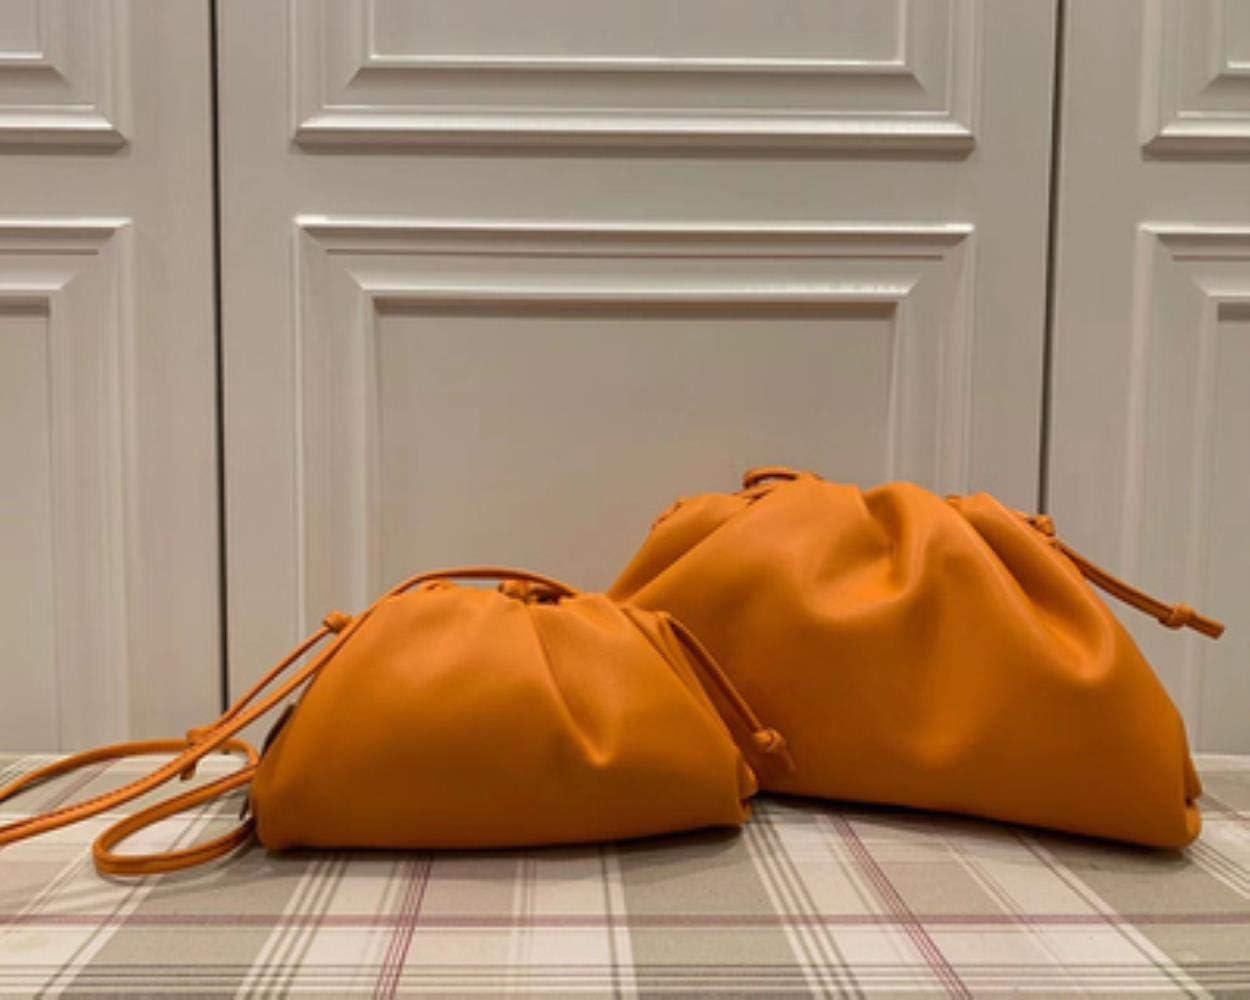 BWM Leather Envelope Bag Handbags Women Bags Rounded Shape Purses and Handbags Clutches,Purple Small Orange Big